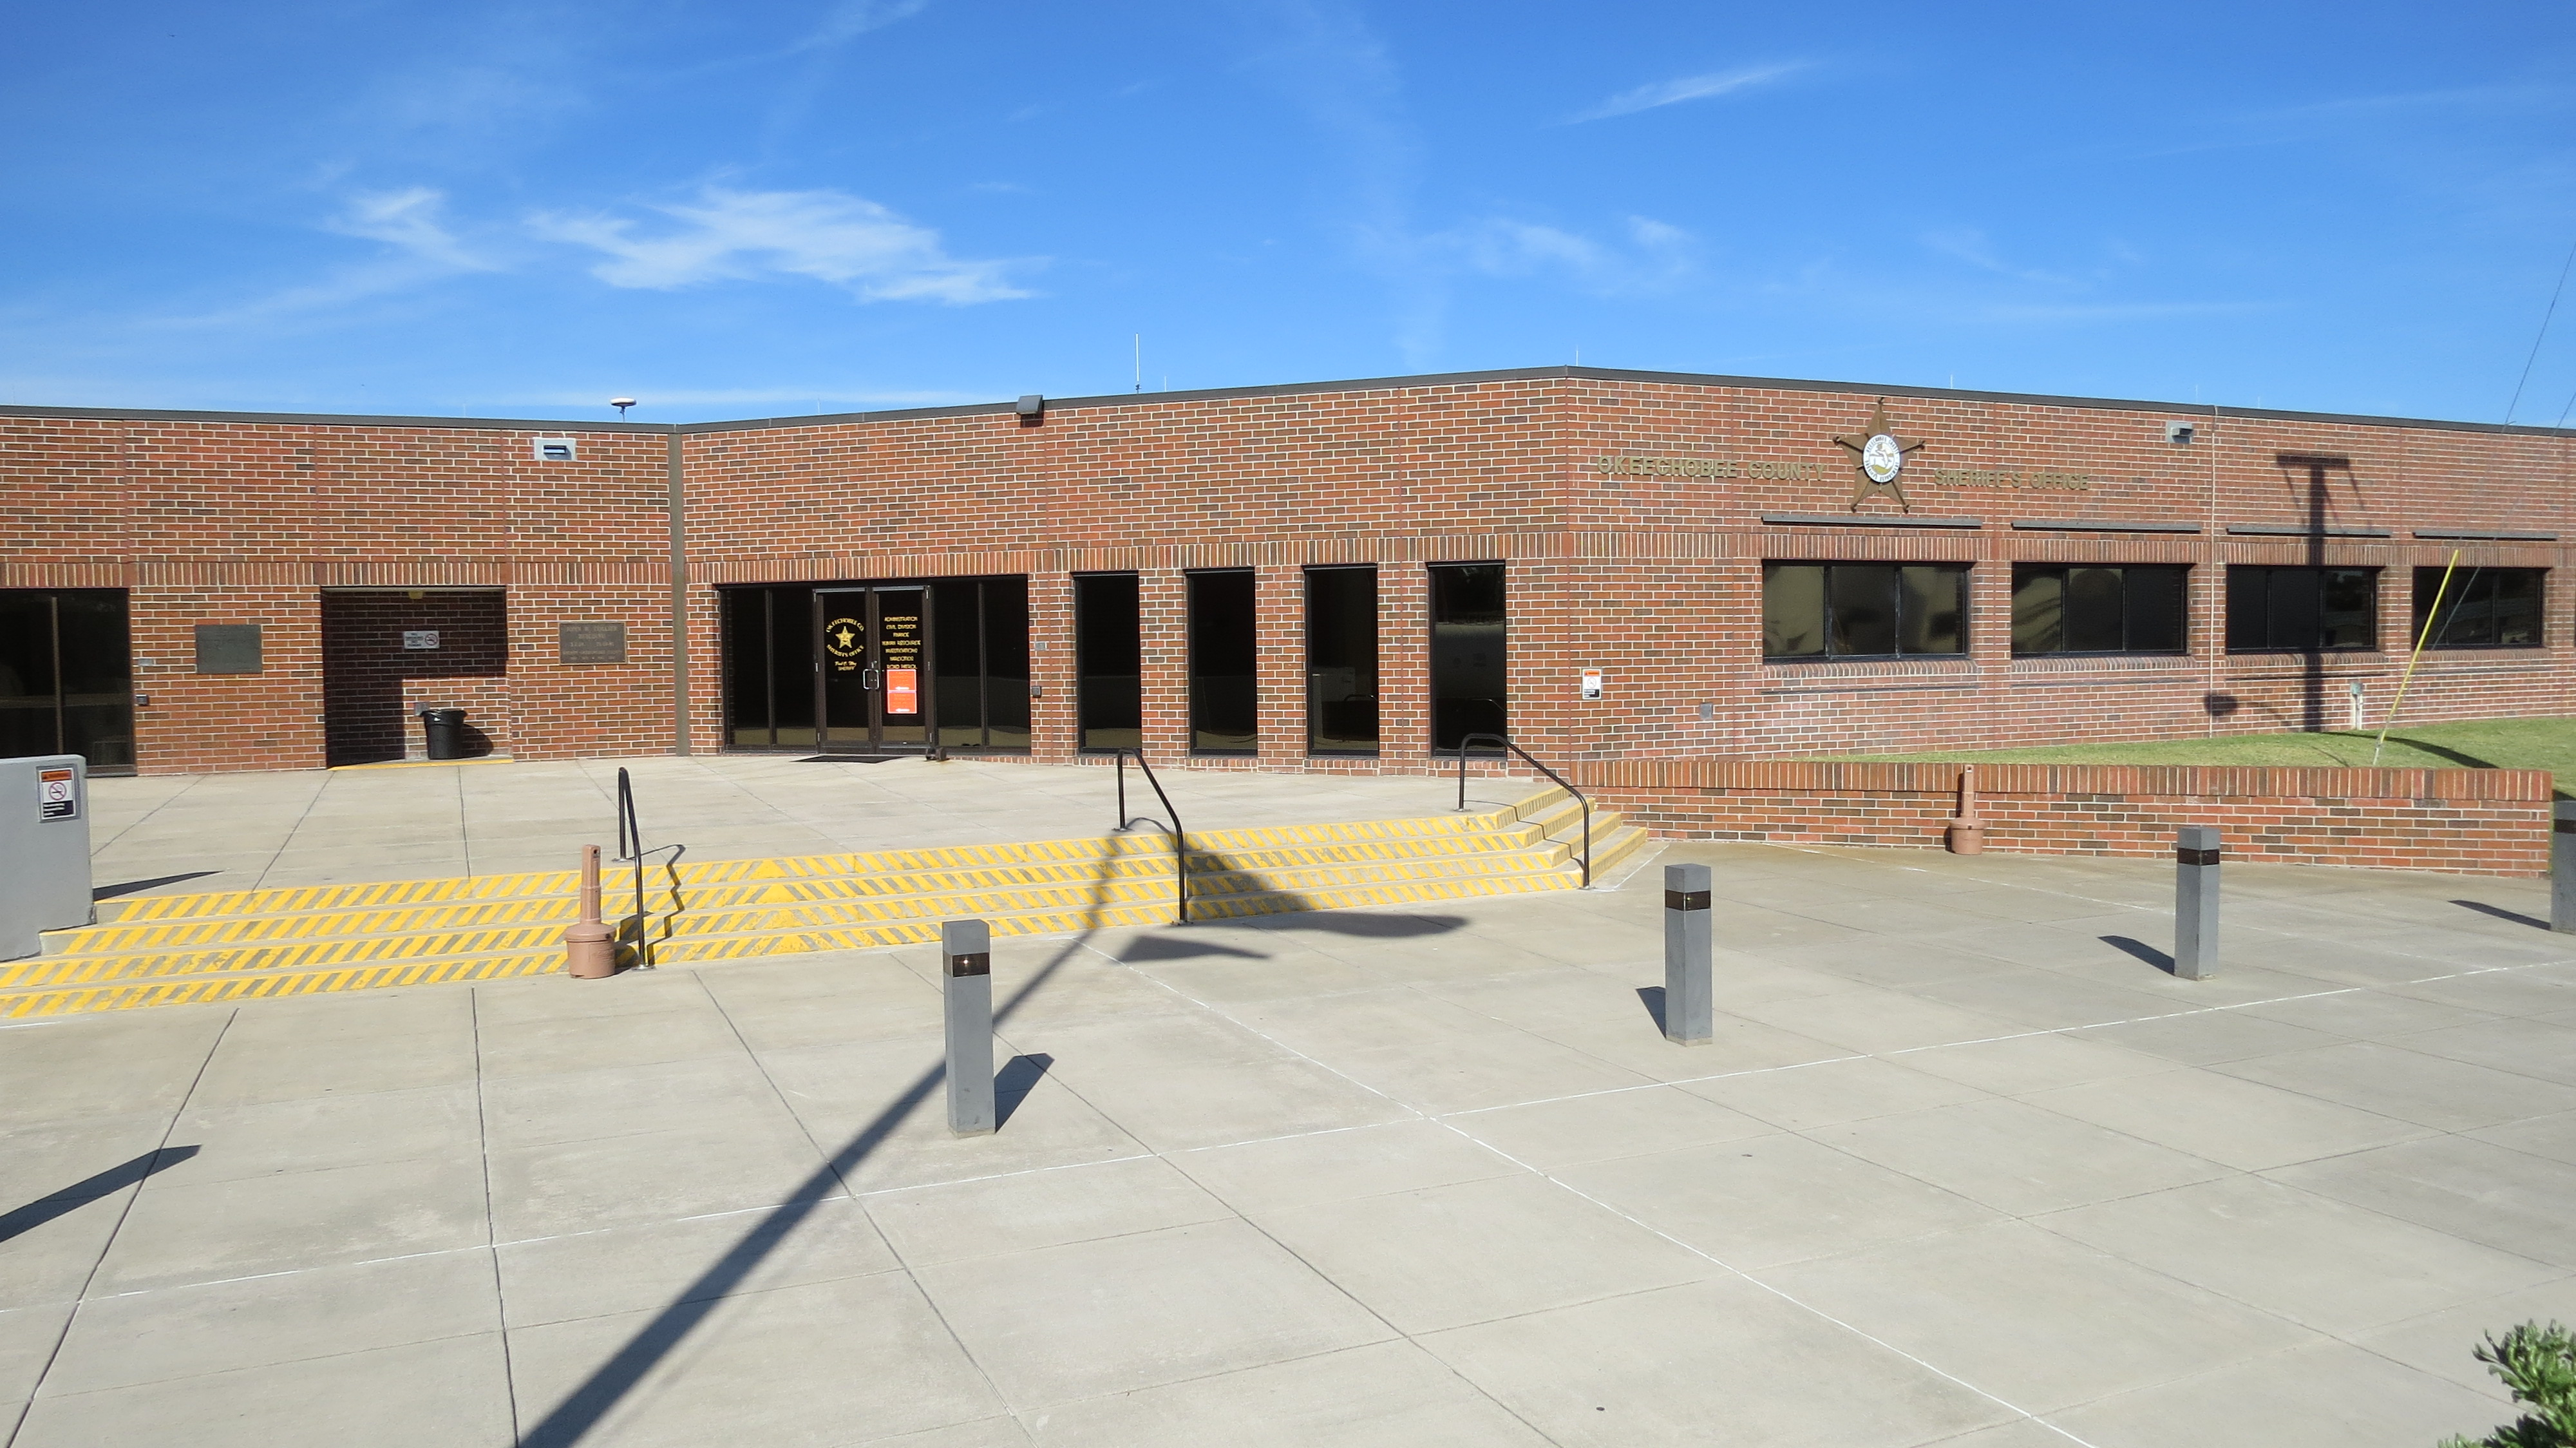 Okeechobee County Sheriff's Office, Town of Okeechobee